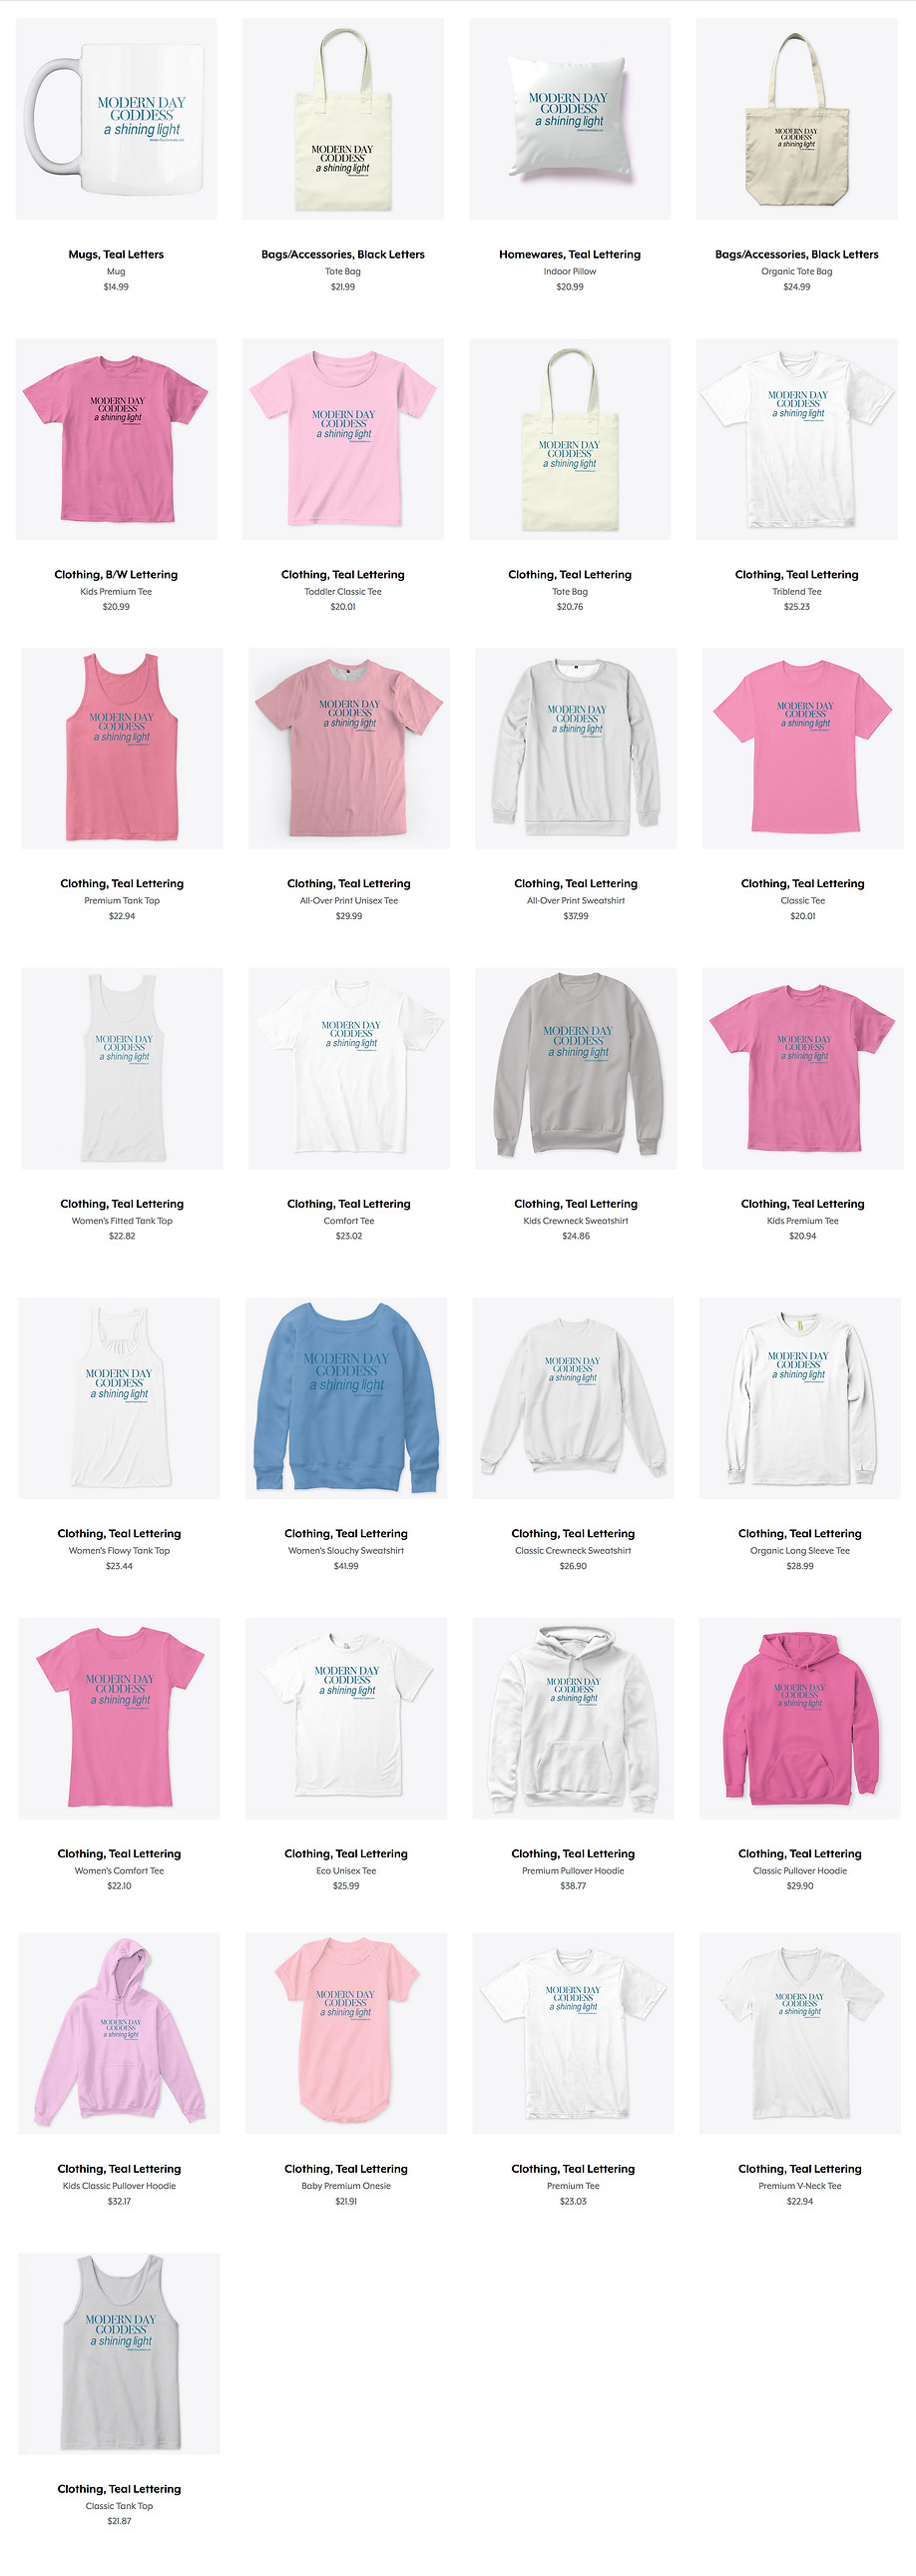 Cynthia Daddona Storefront for mugs, clothing, homewares, bags, shirts, tee-shirts and more